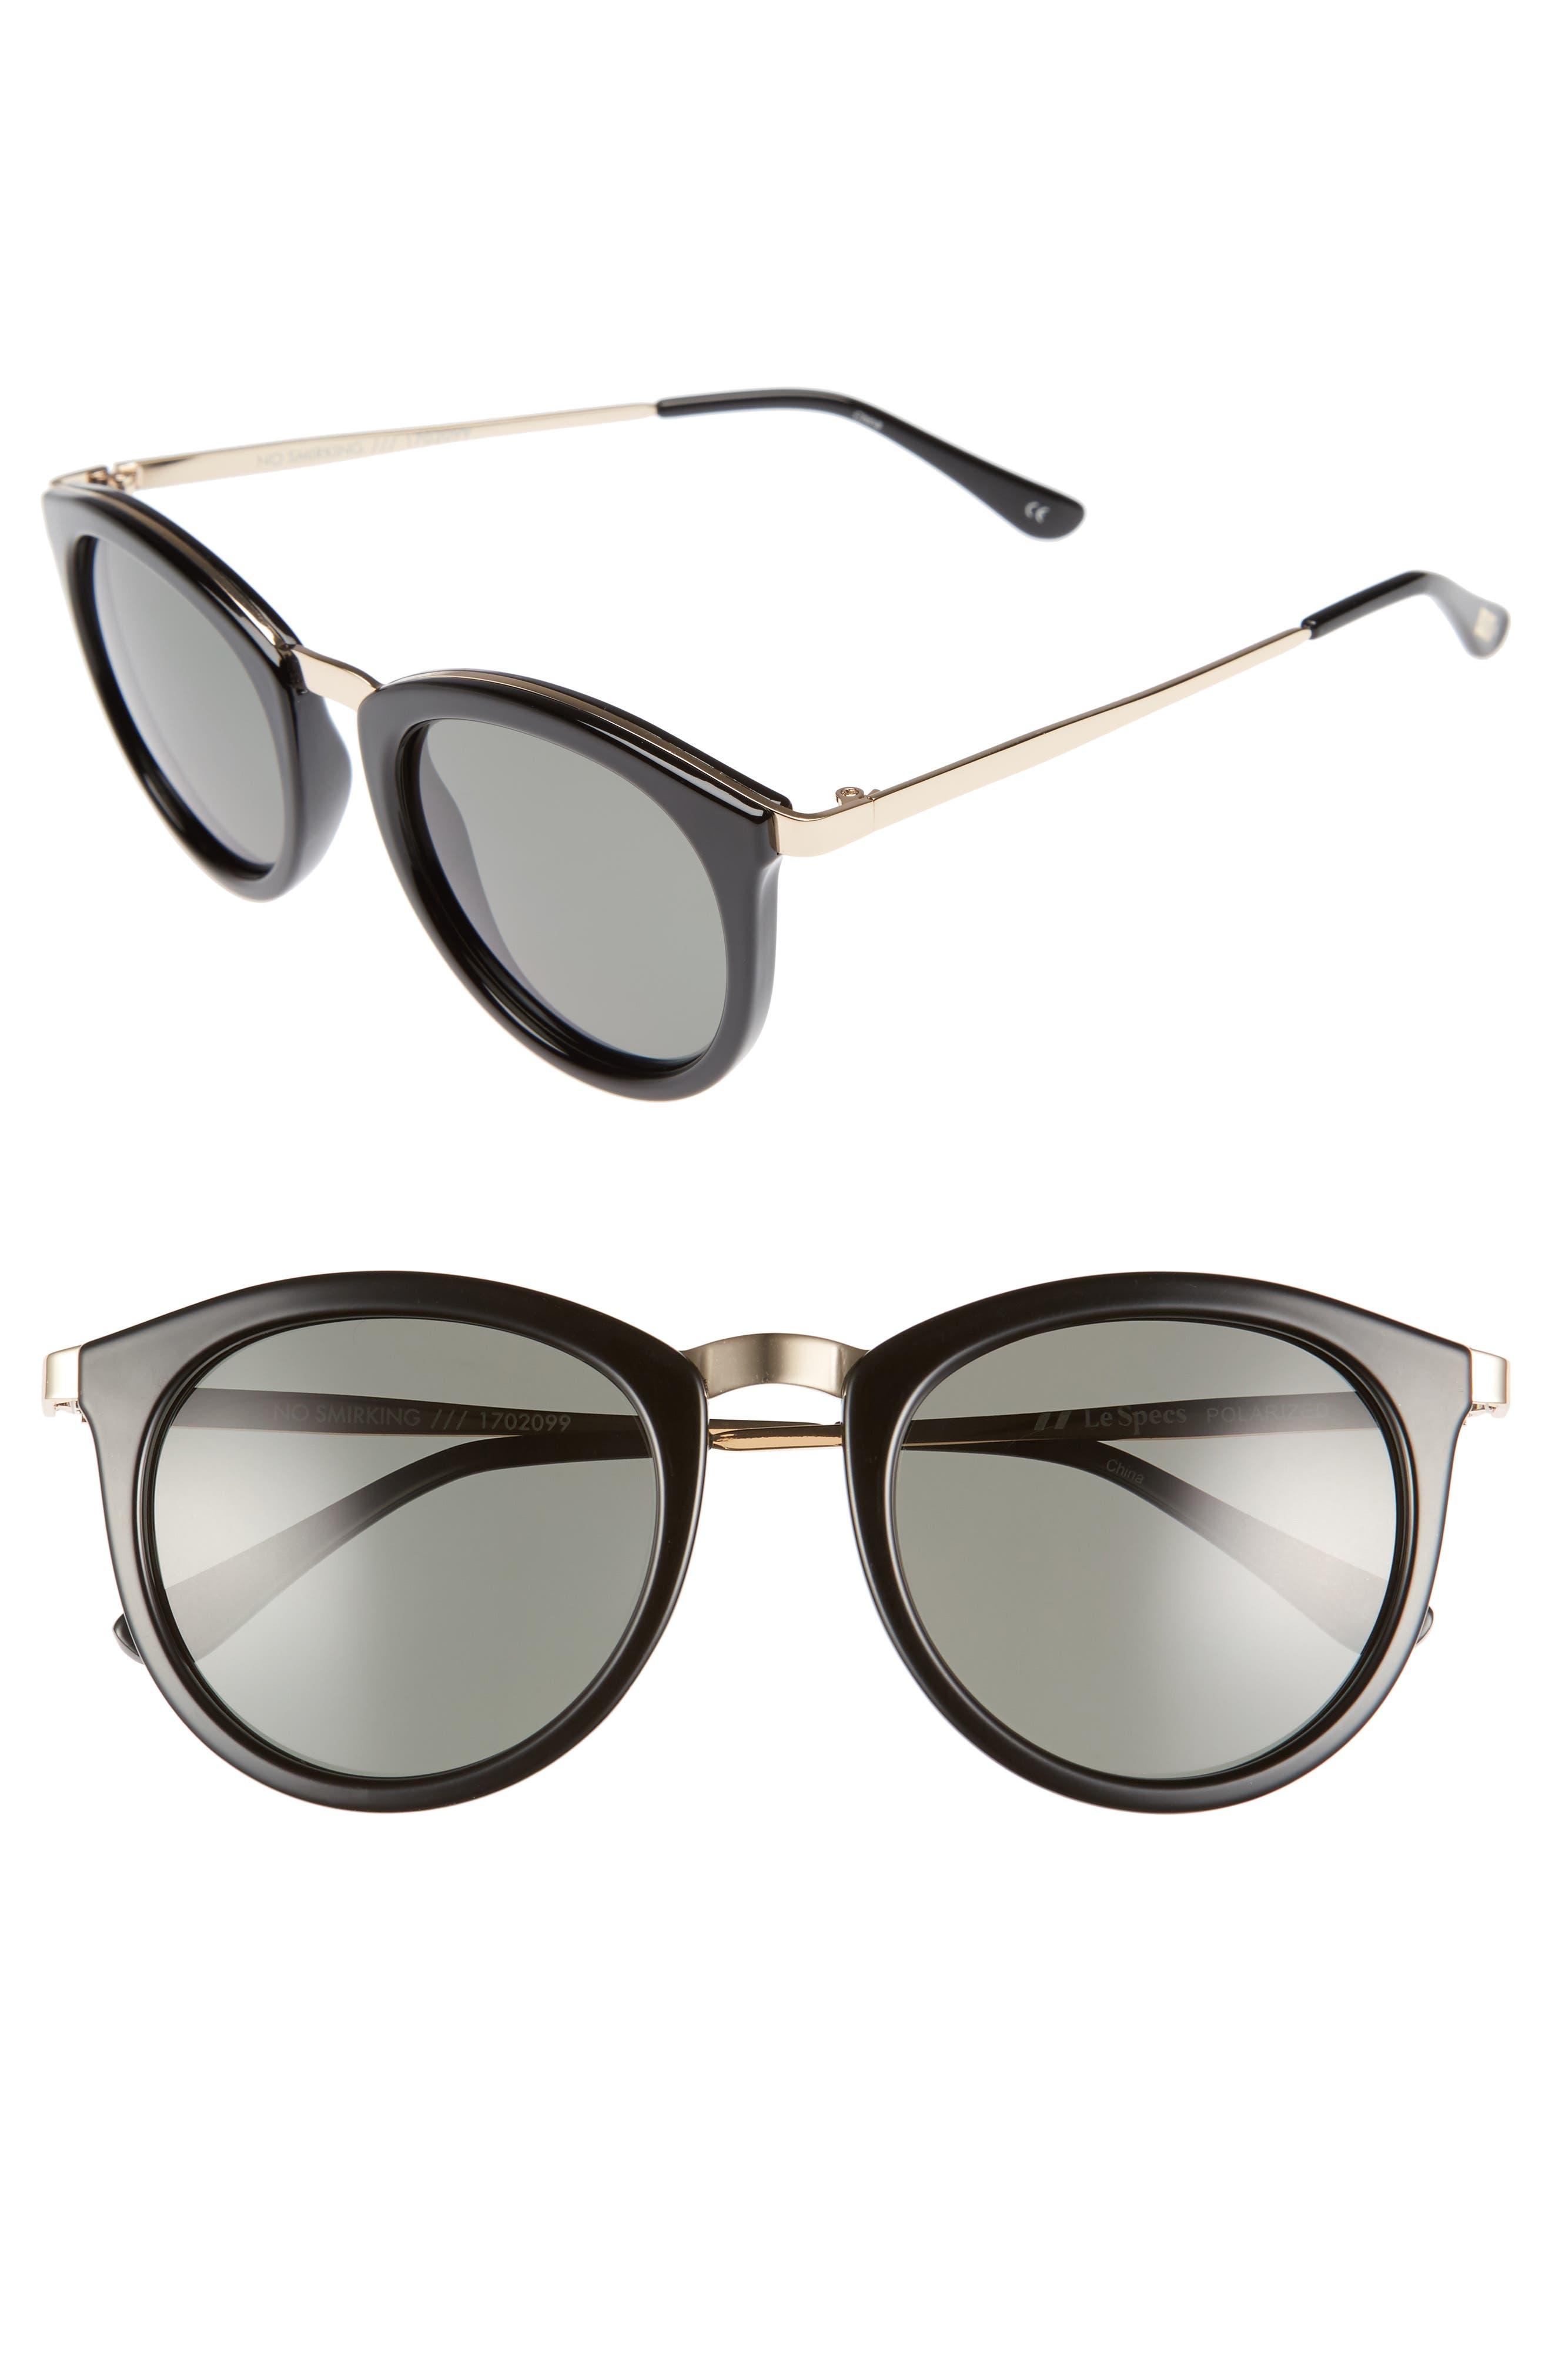 Main Image - Le Specs No Smirking 51mm Polarized Sunglasses